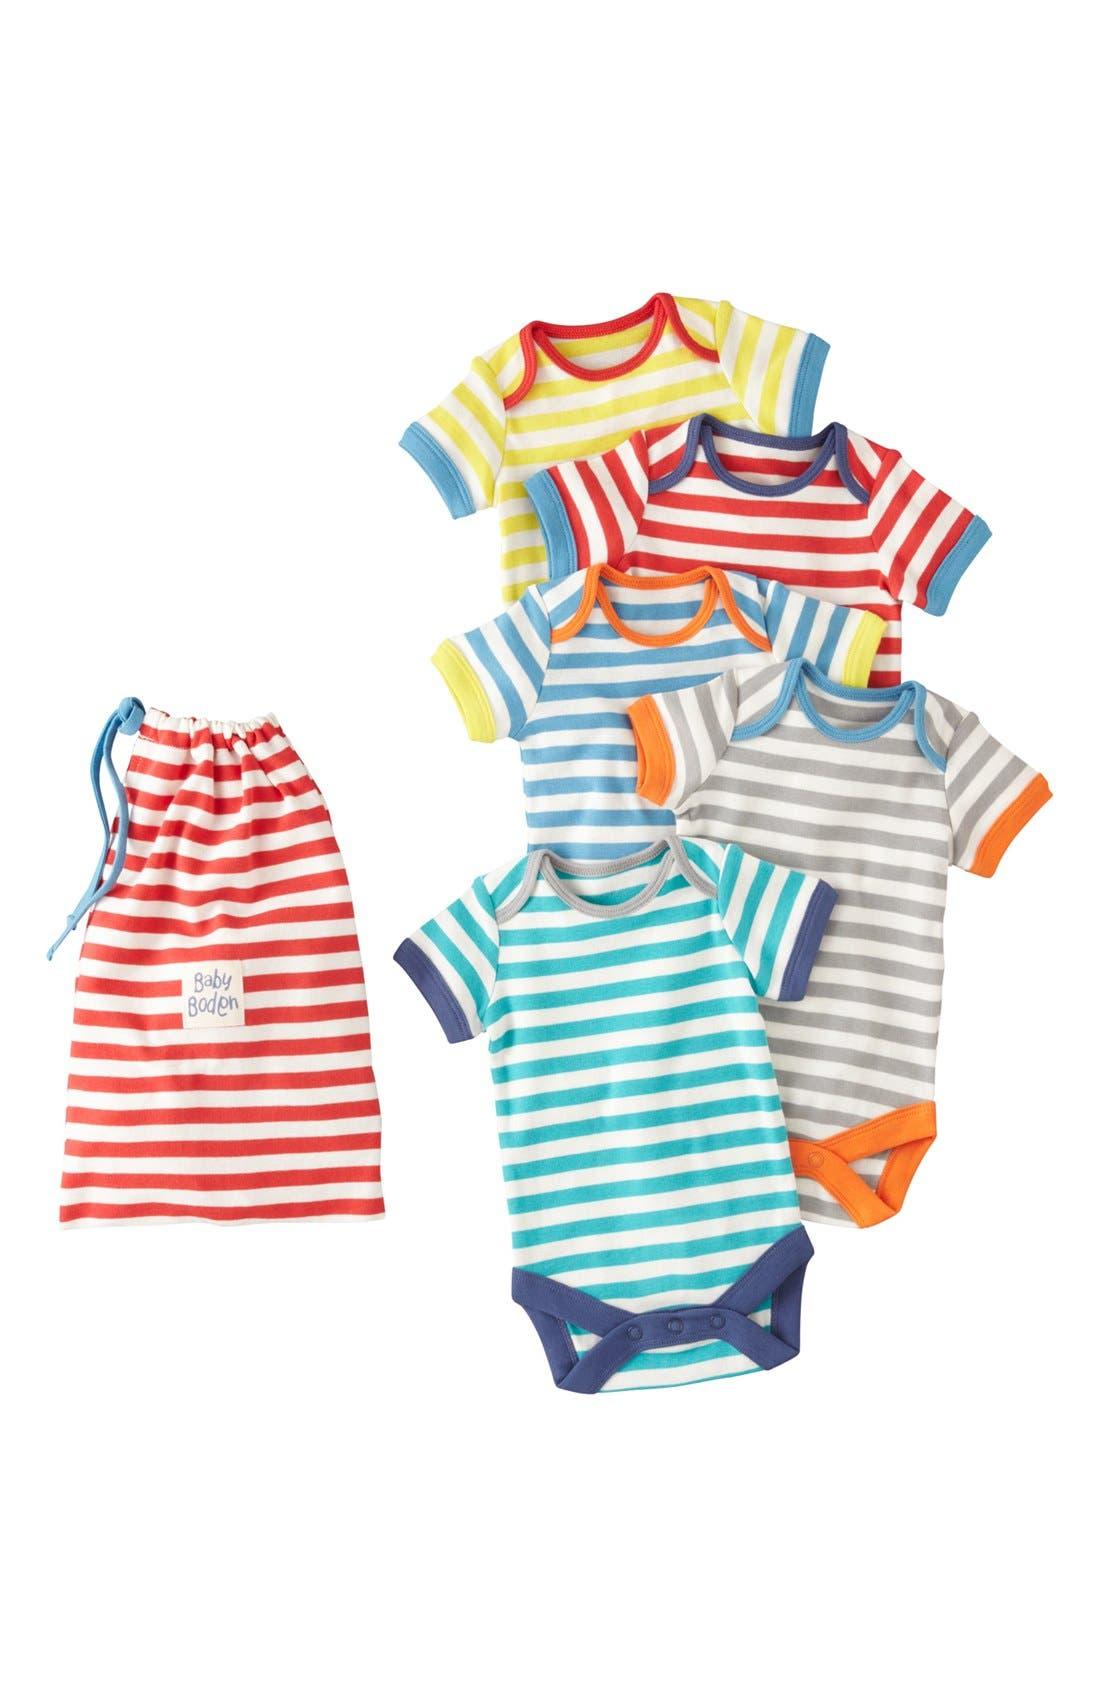 Alternate Image 1 Selected - Mini Boden 'Summer' Bodysuits (5-Pack) (Baby Boys)